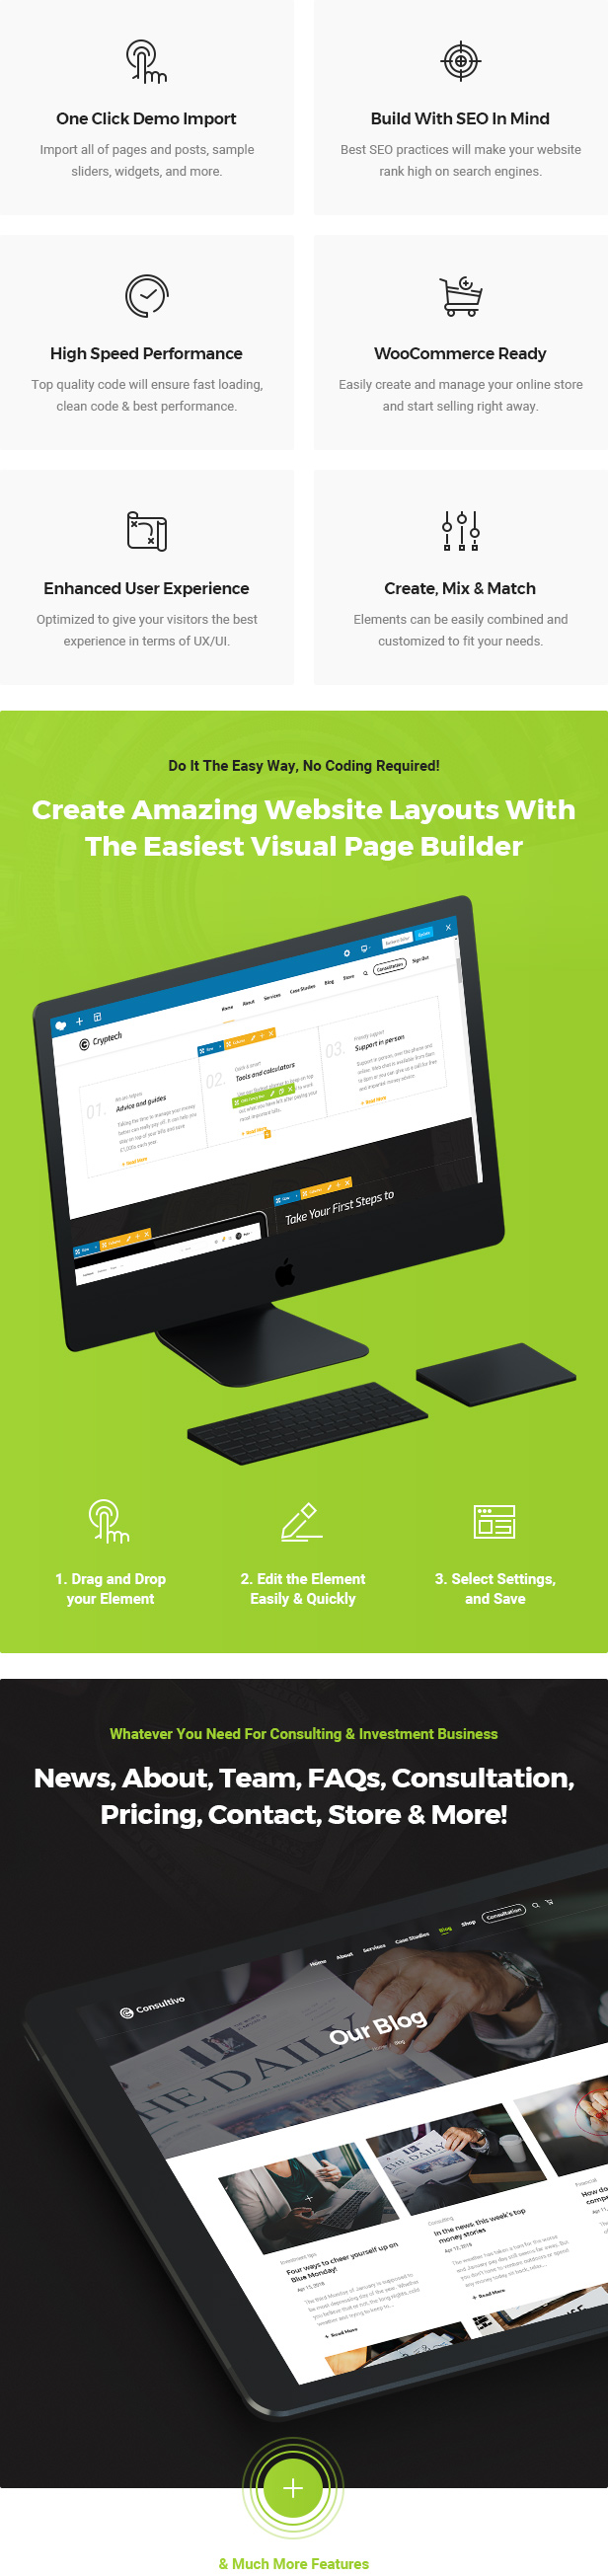 Consultivo - Unternehmensberatung und Investitionen WordPress Theme - 7